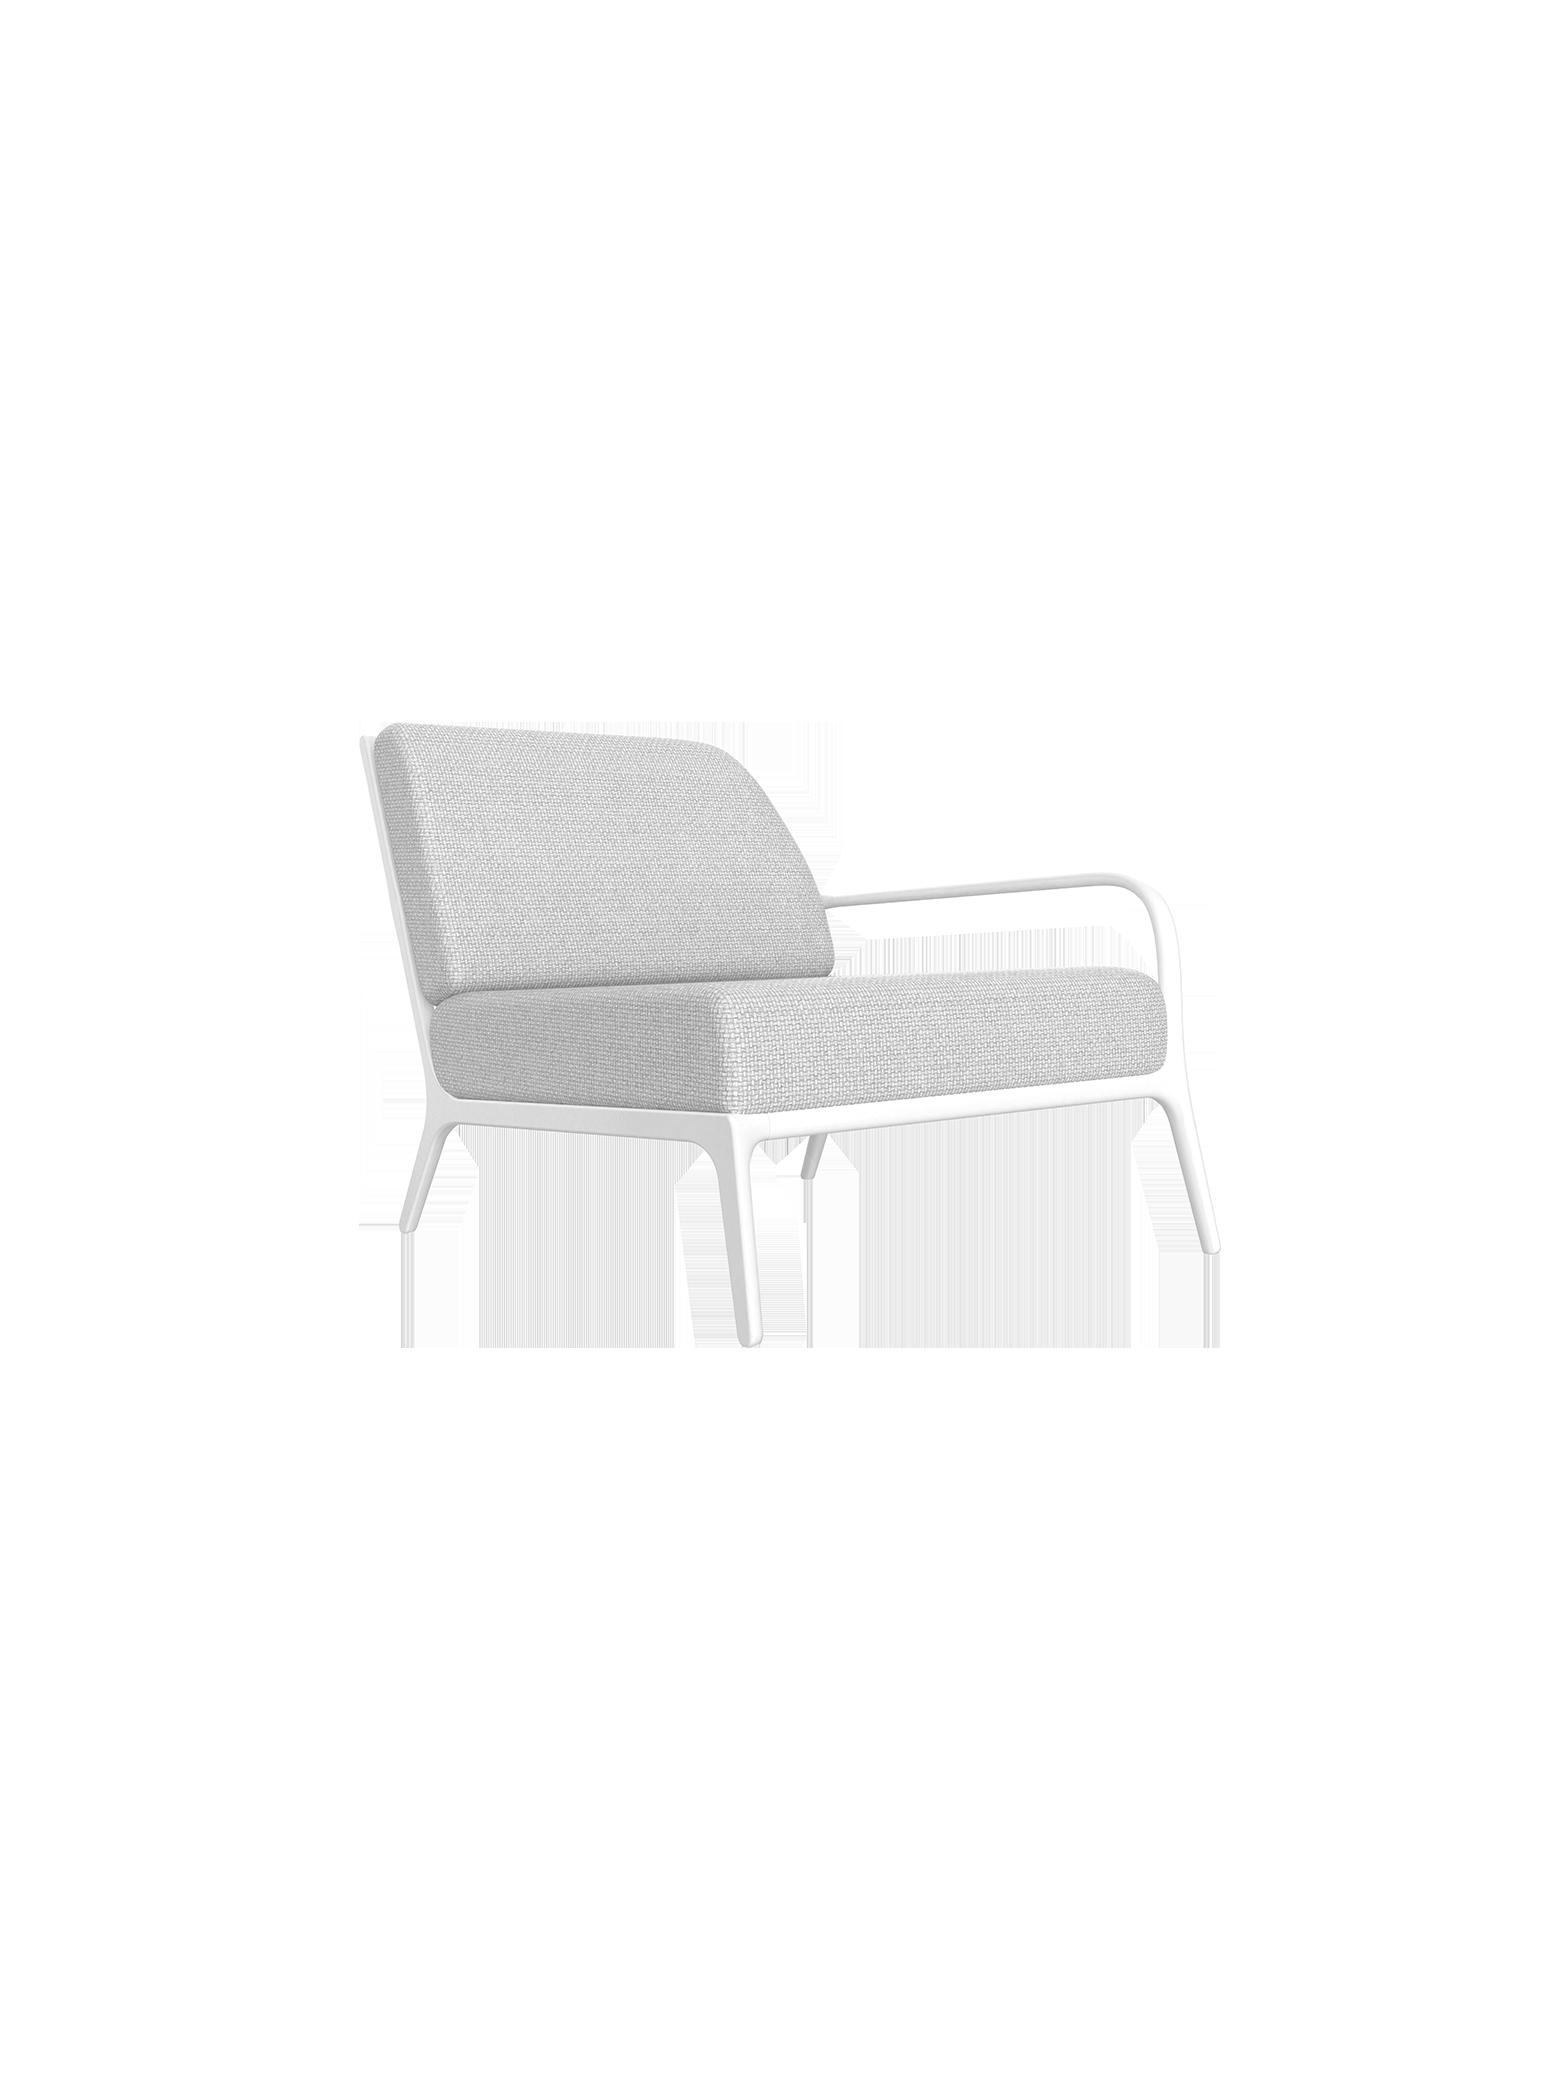 Sofá Modular Izquierdo 90